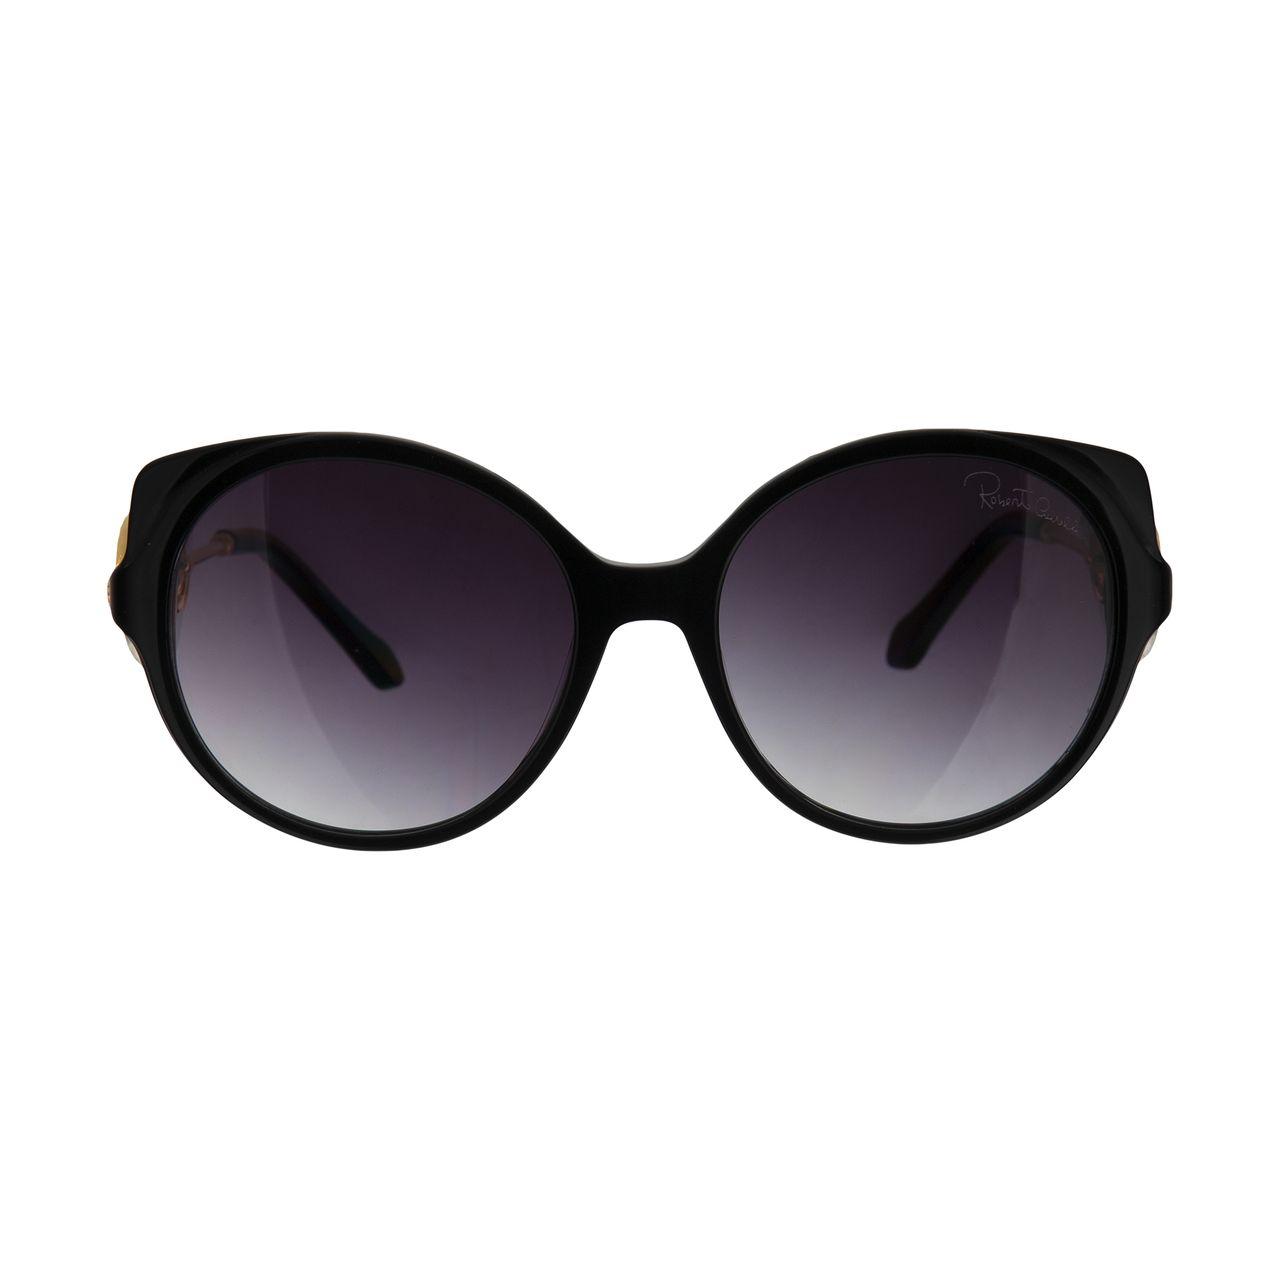 عینک آفتابی زنانه روبرتو کاوالی مدل 1035